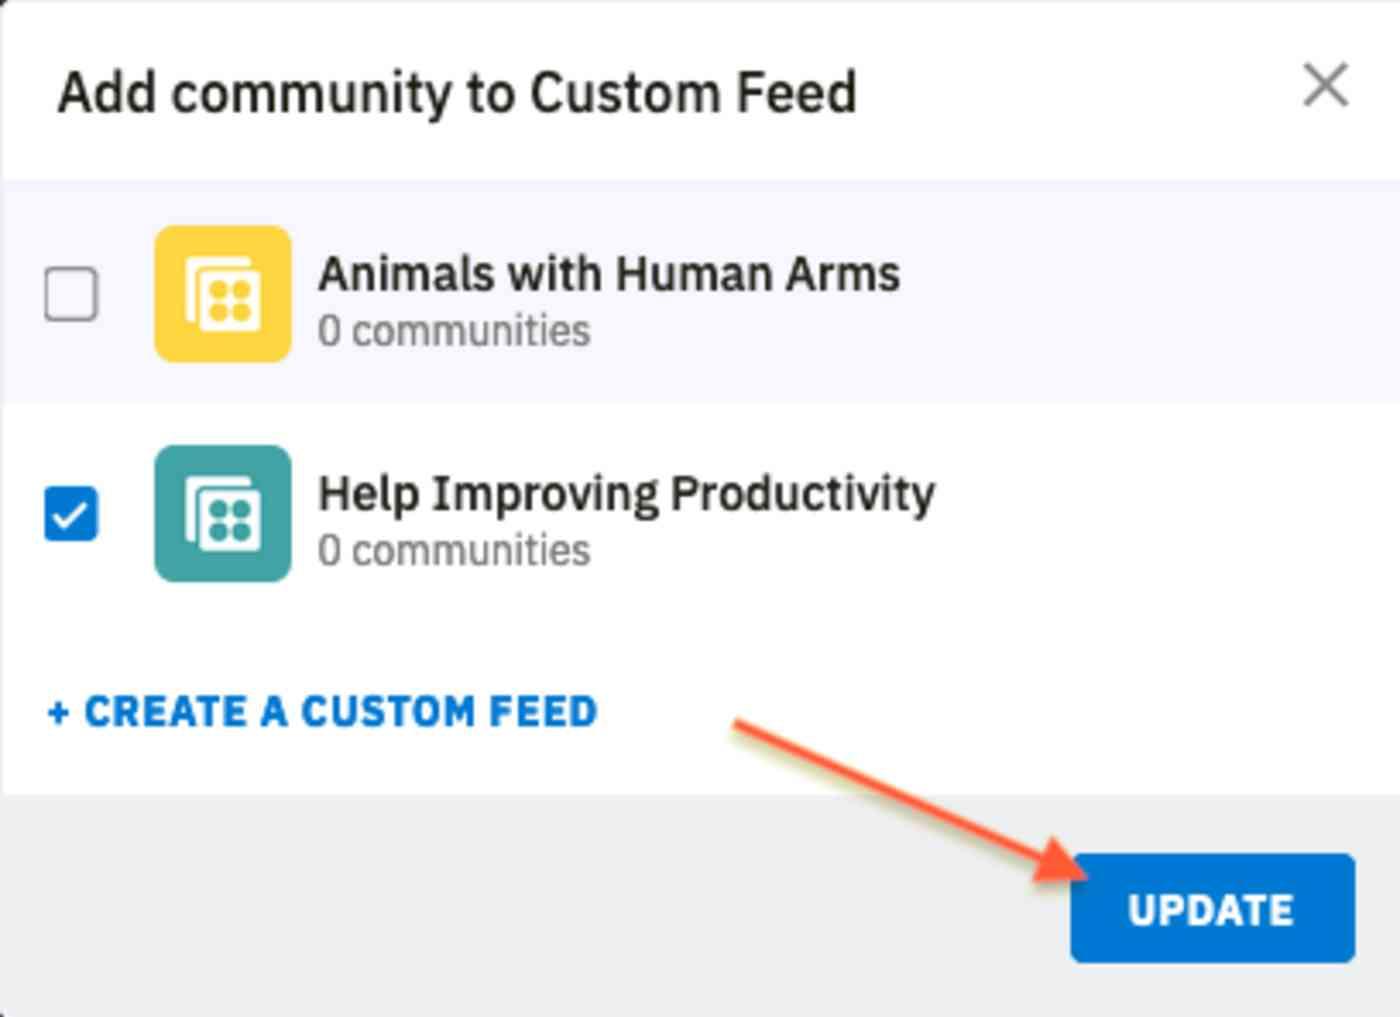 Updating custom feeds